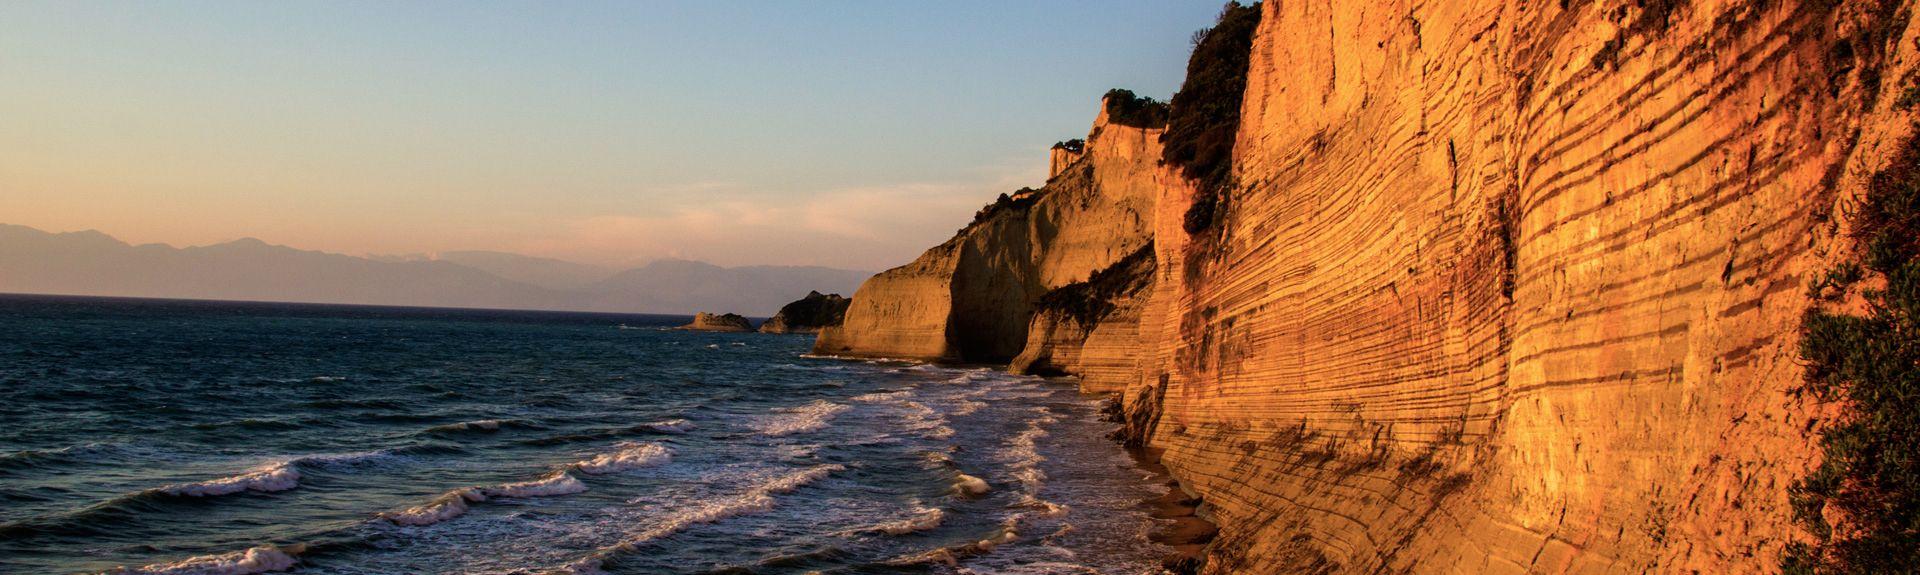 Pagoi, Greece